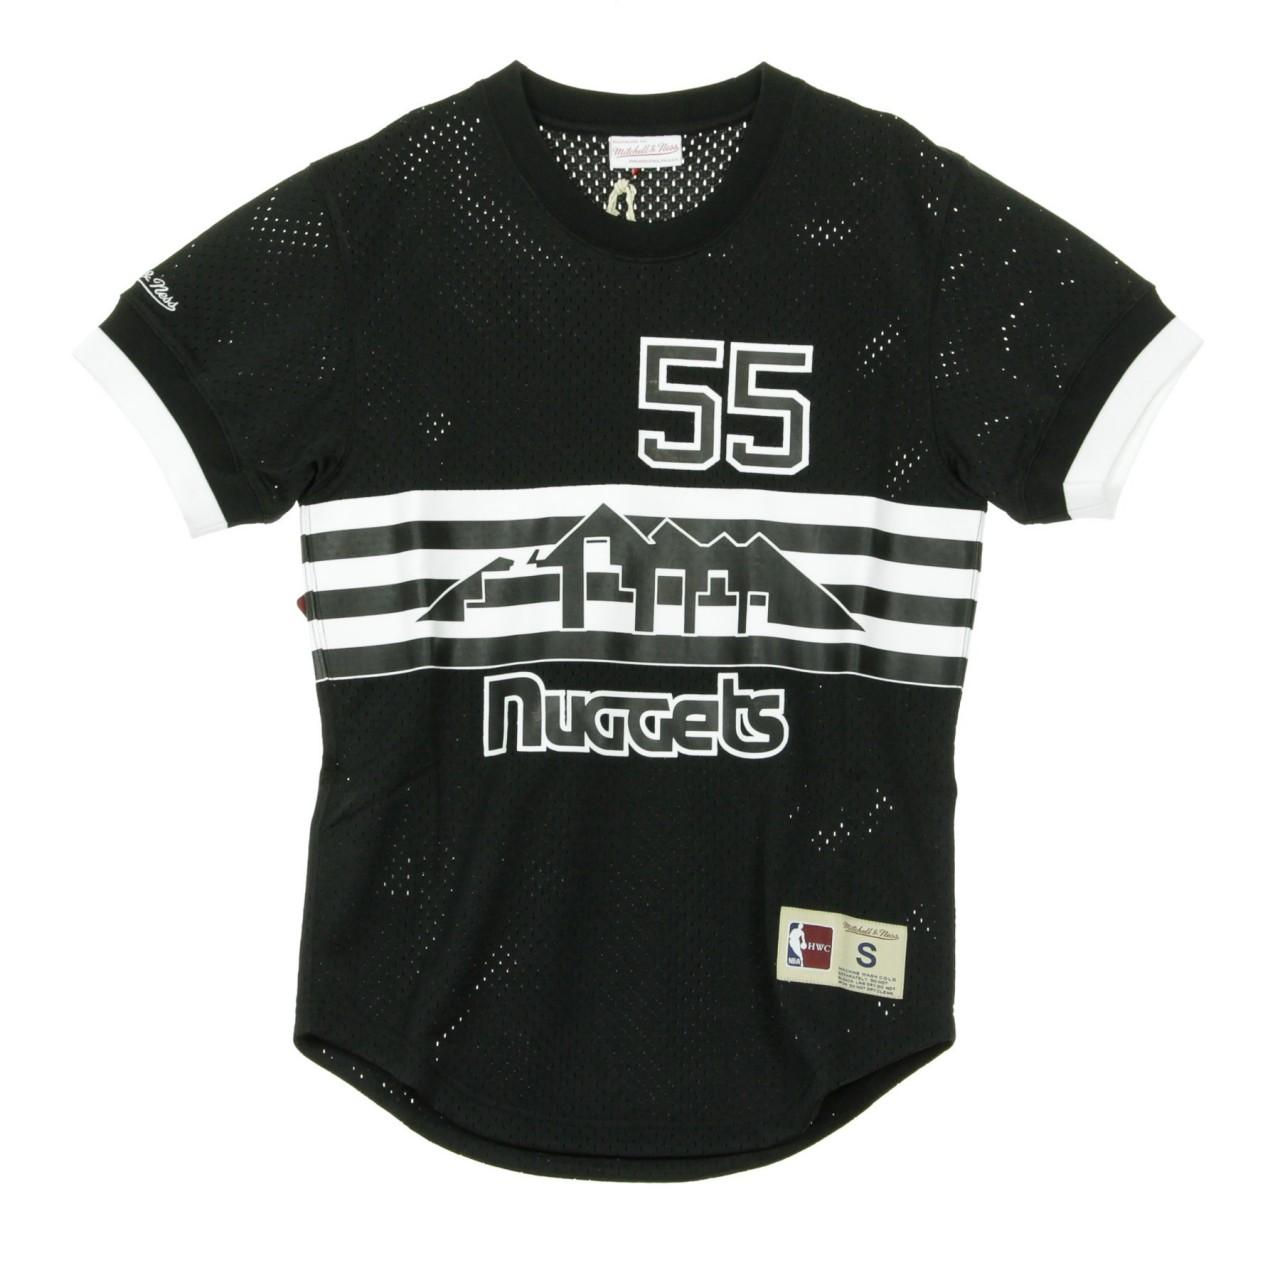 MITCHELL & NESS BLACK & WHITE MESH NAME & NUMBER CREWNECK DICKEMBE MUTOMBO NO.55 DENNUG BA8X4G-DNU-K-KVQ